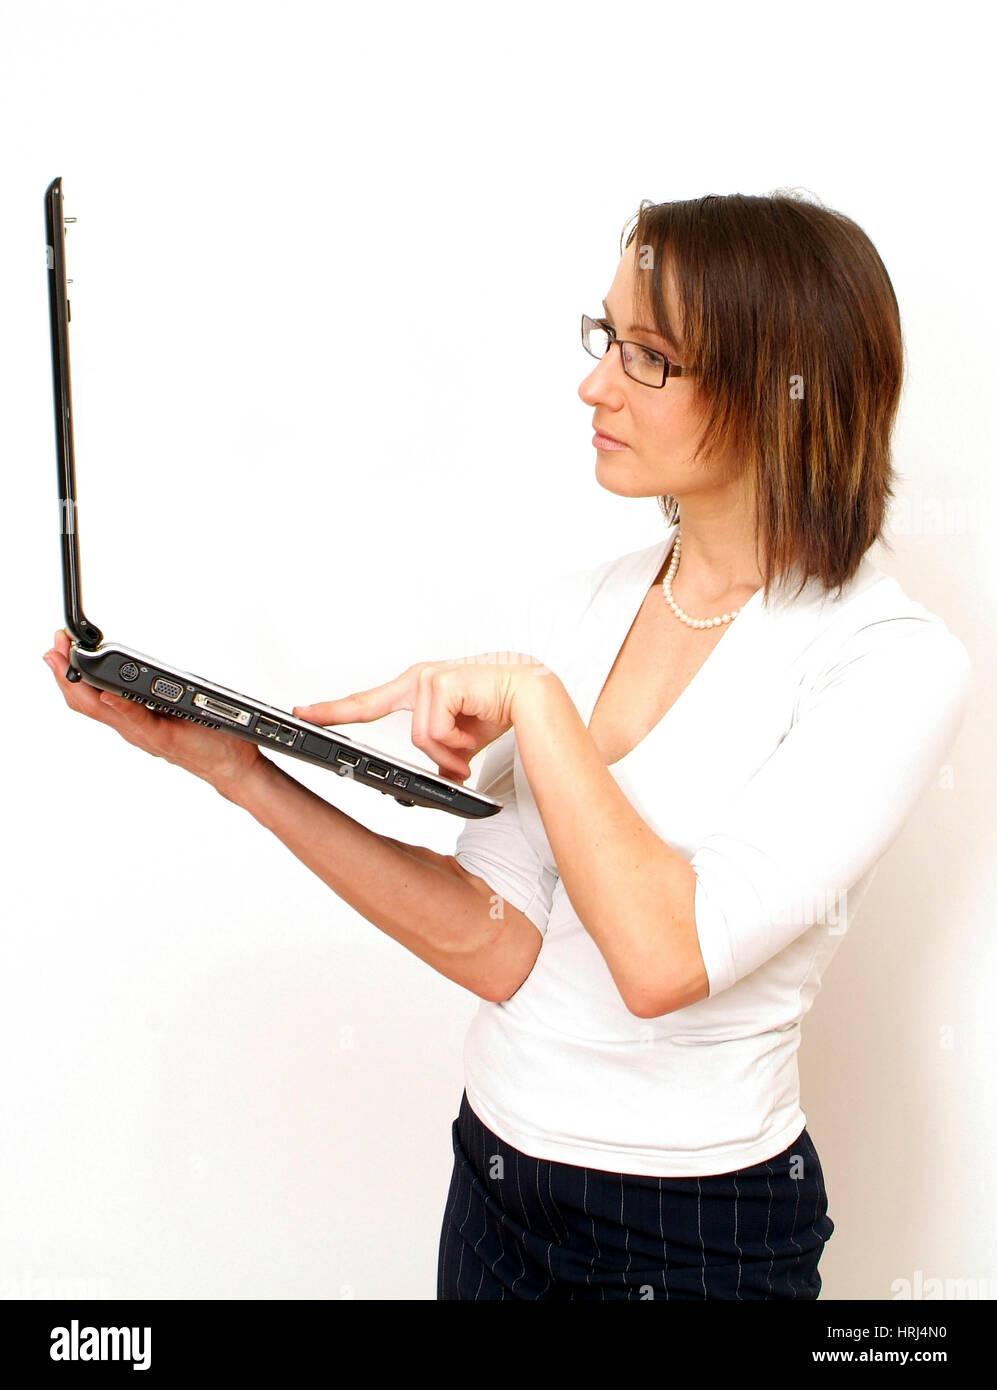 Junge Gesch?ftsfrau arbeitet am Laptop - young business woman using laptop, Symbolfotos Stock Photo